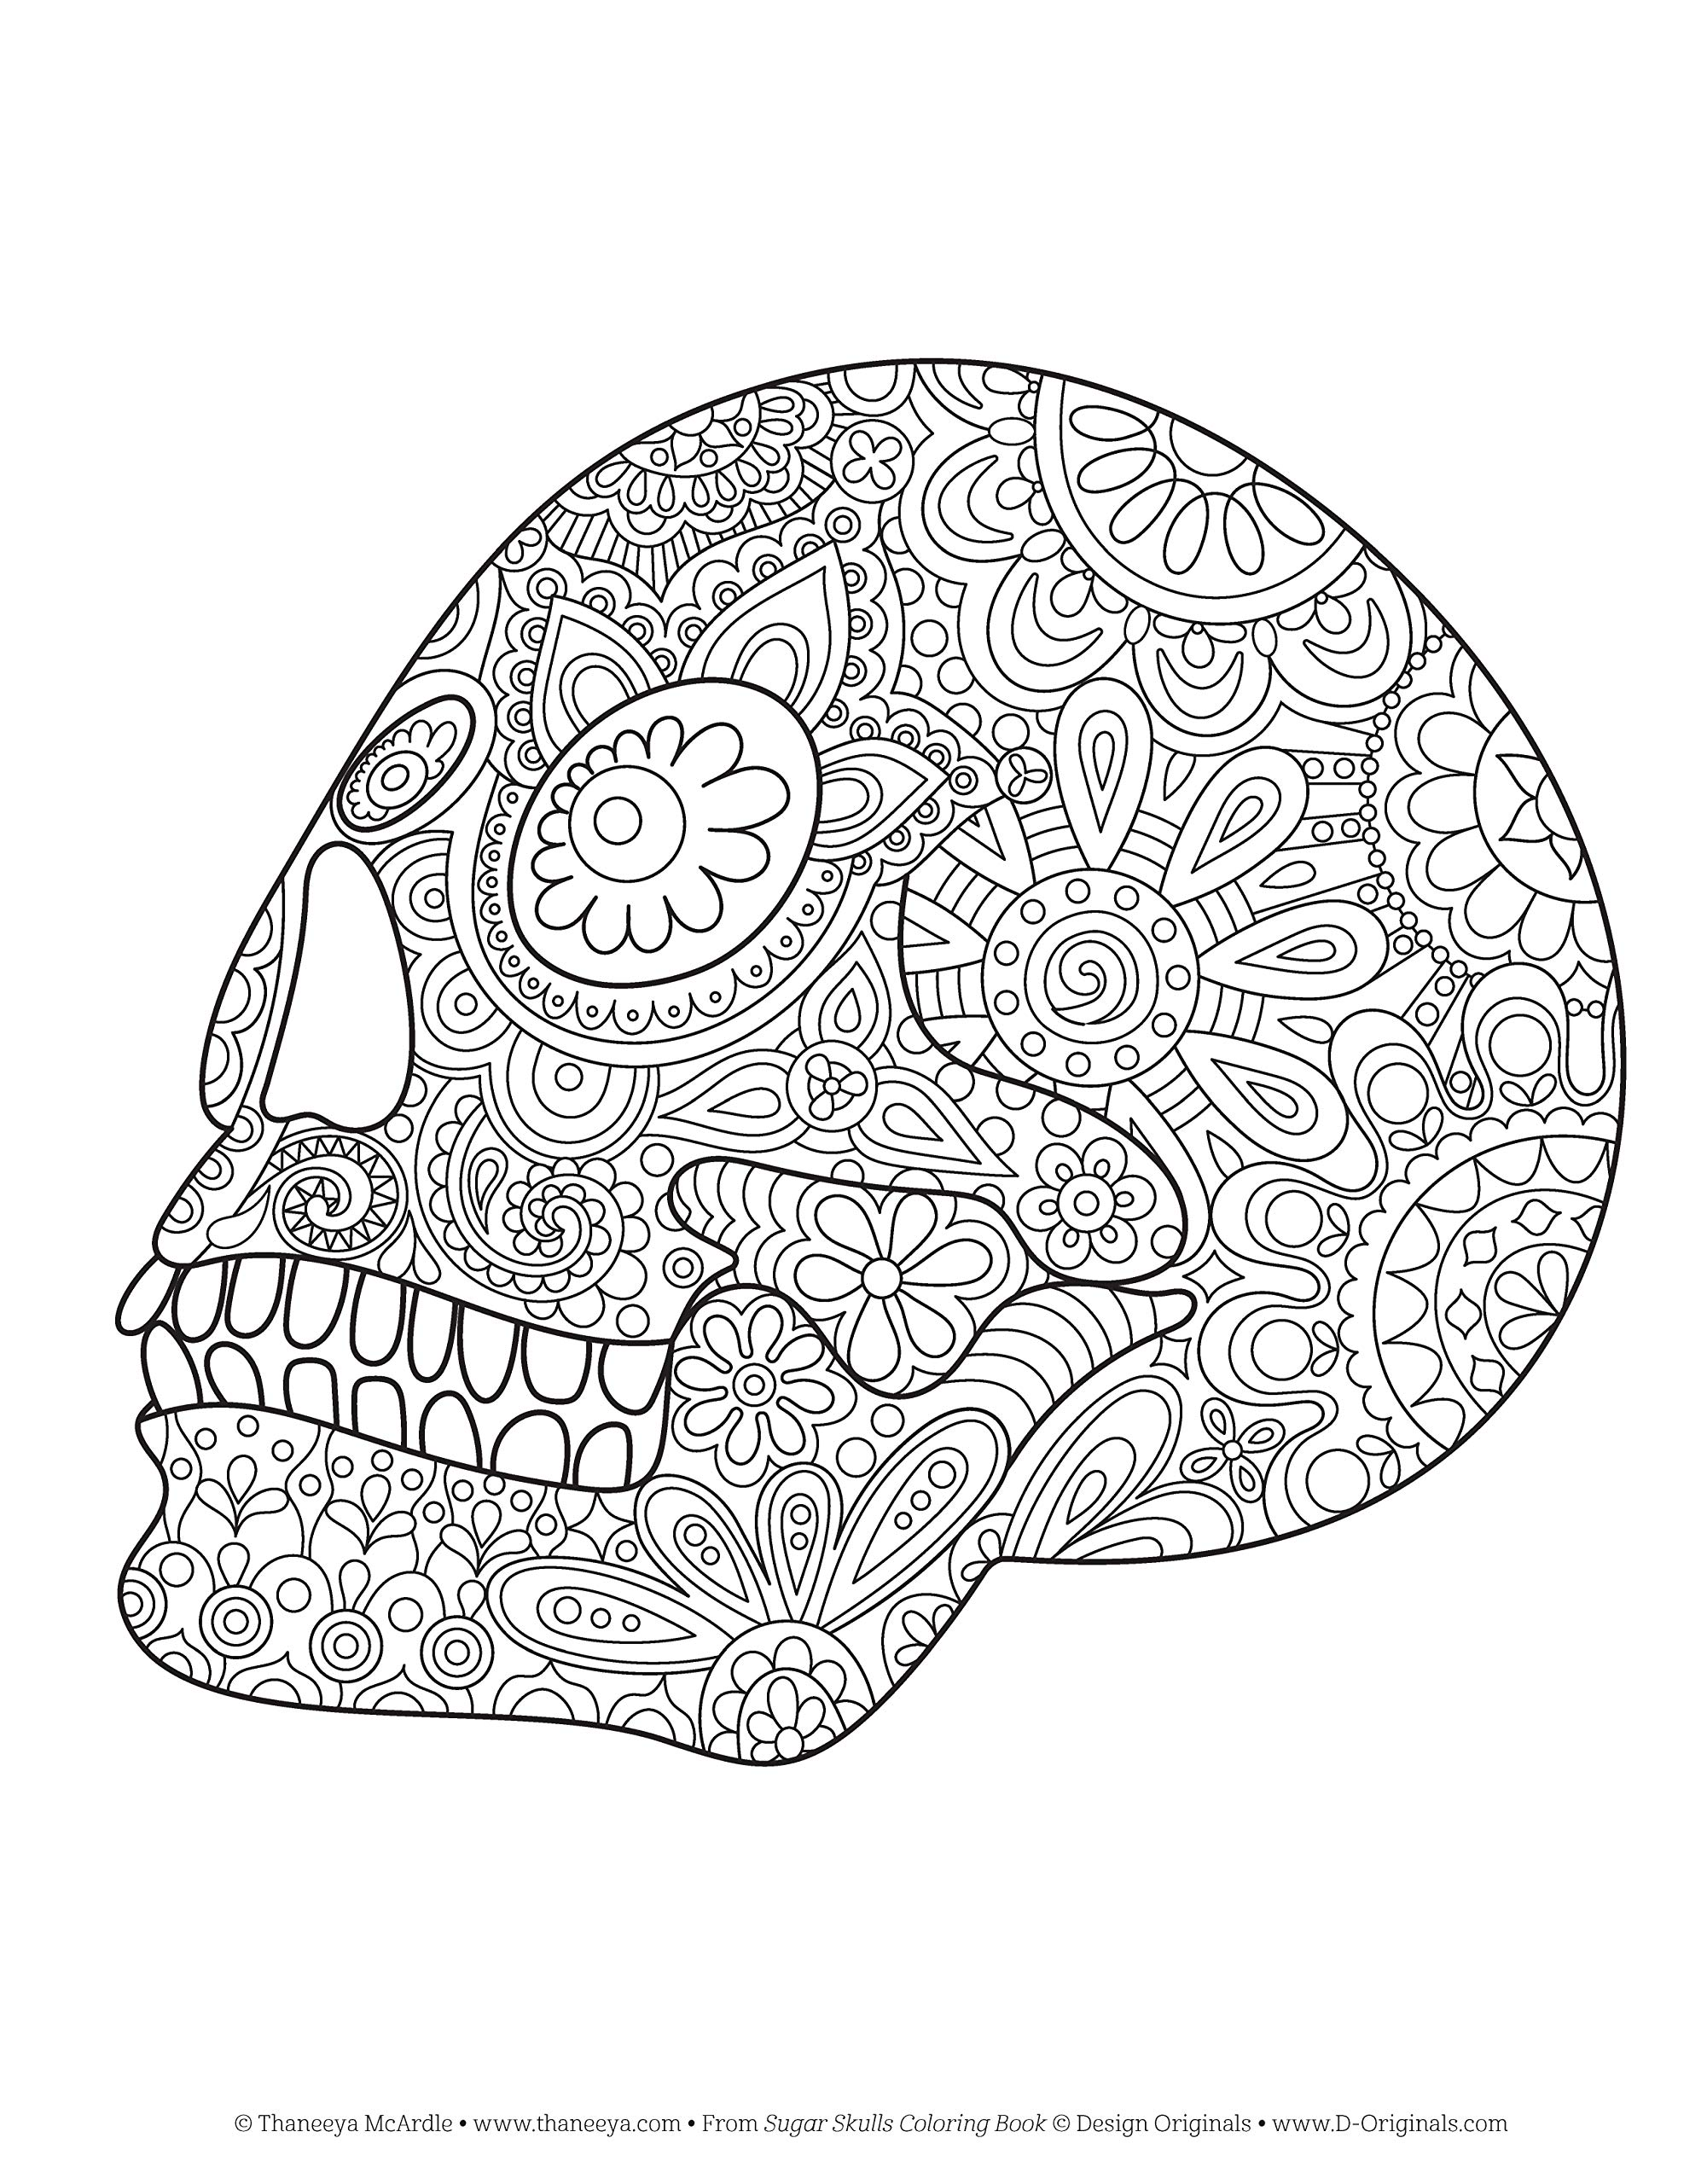 - Amazon.com: Sugar Skulls Coloring Book (Coloring Is Fun) (Design